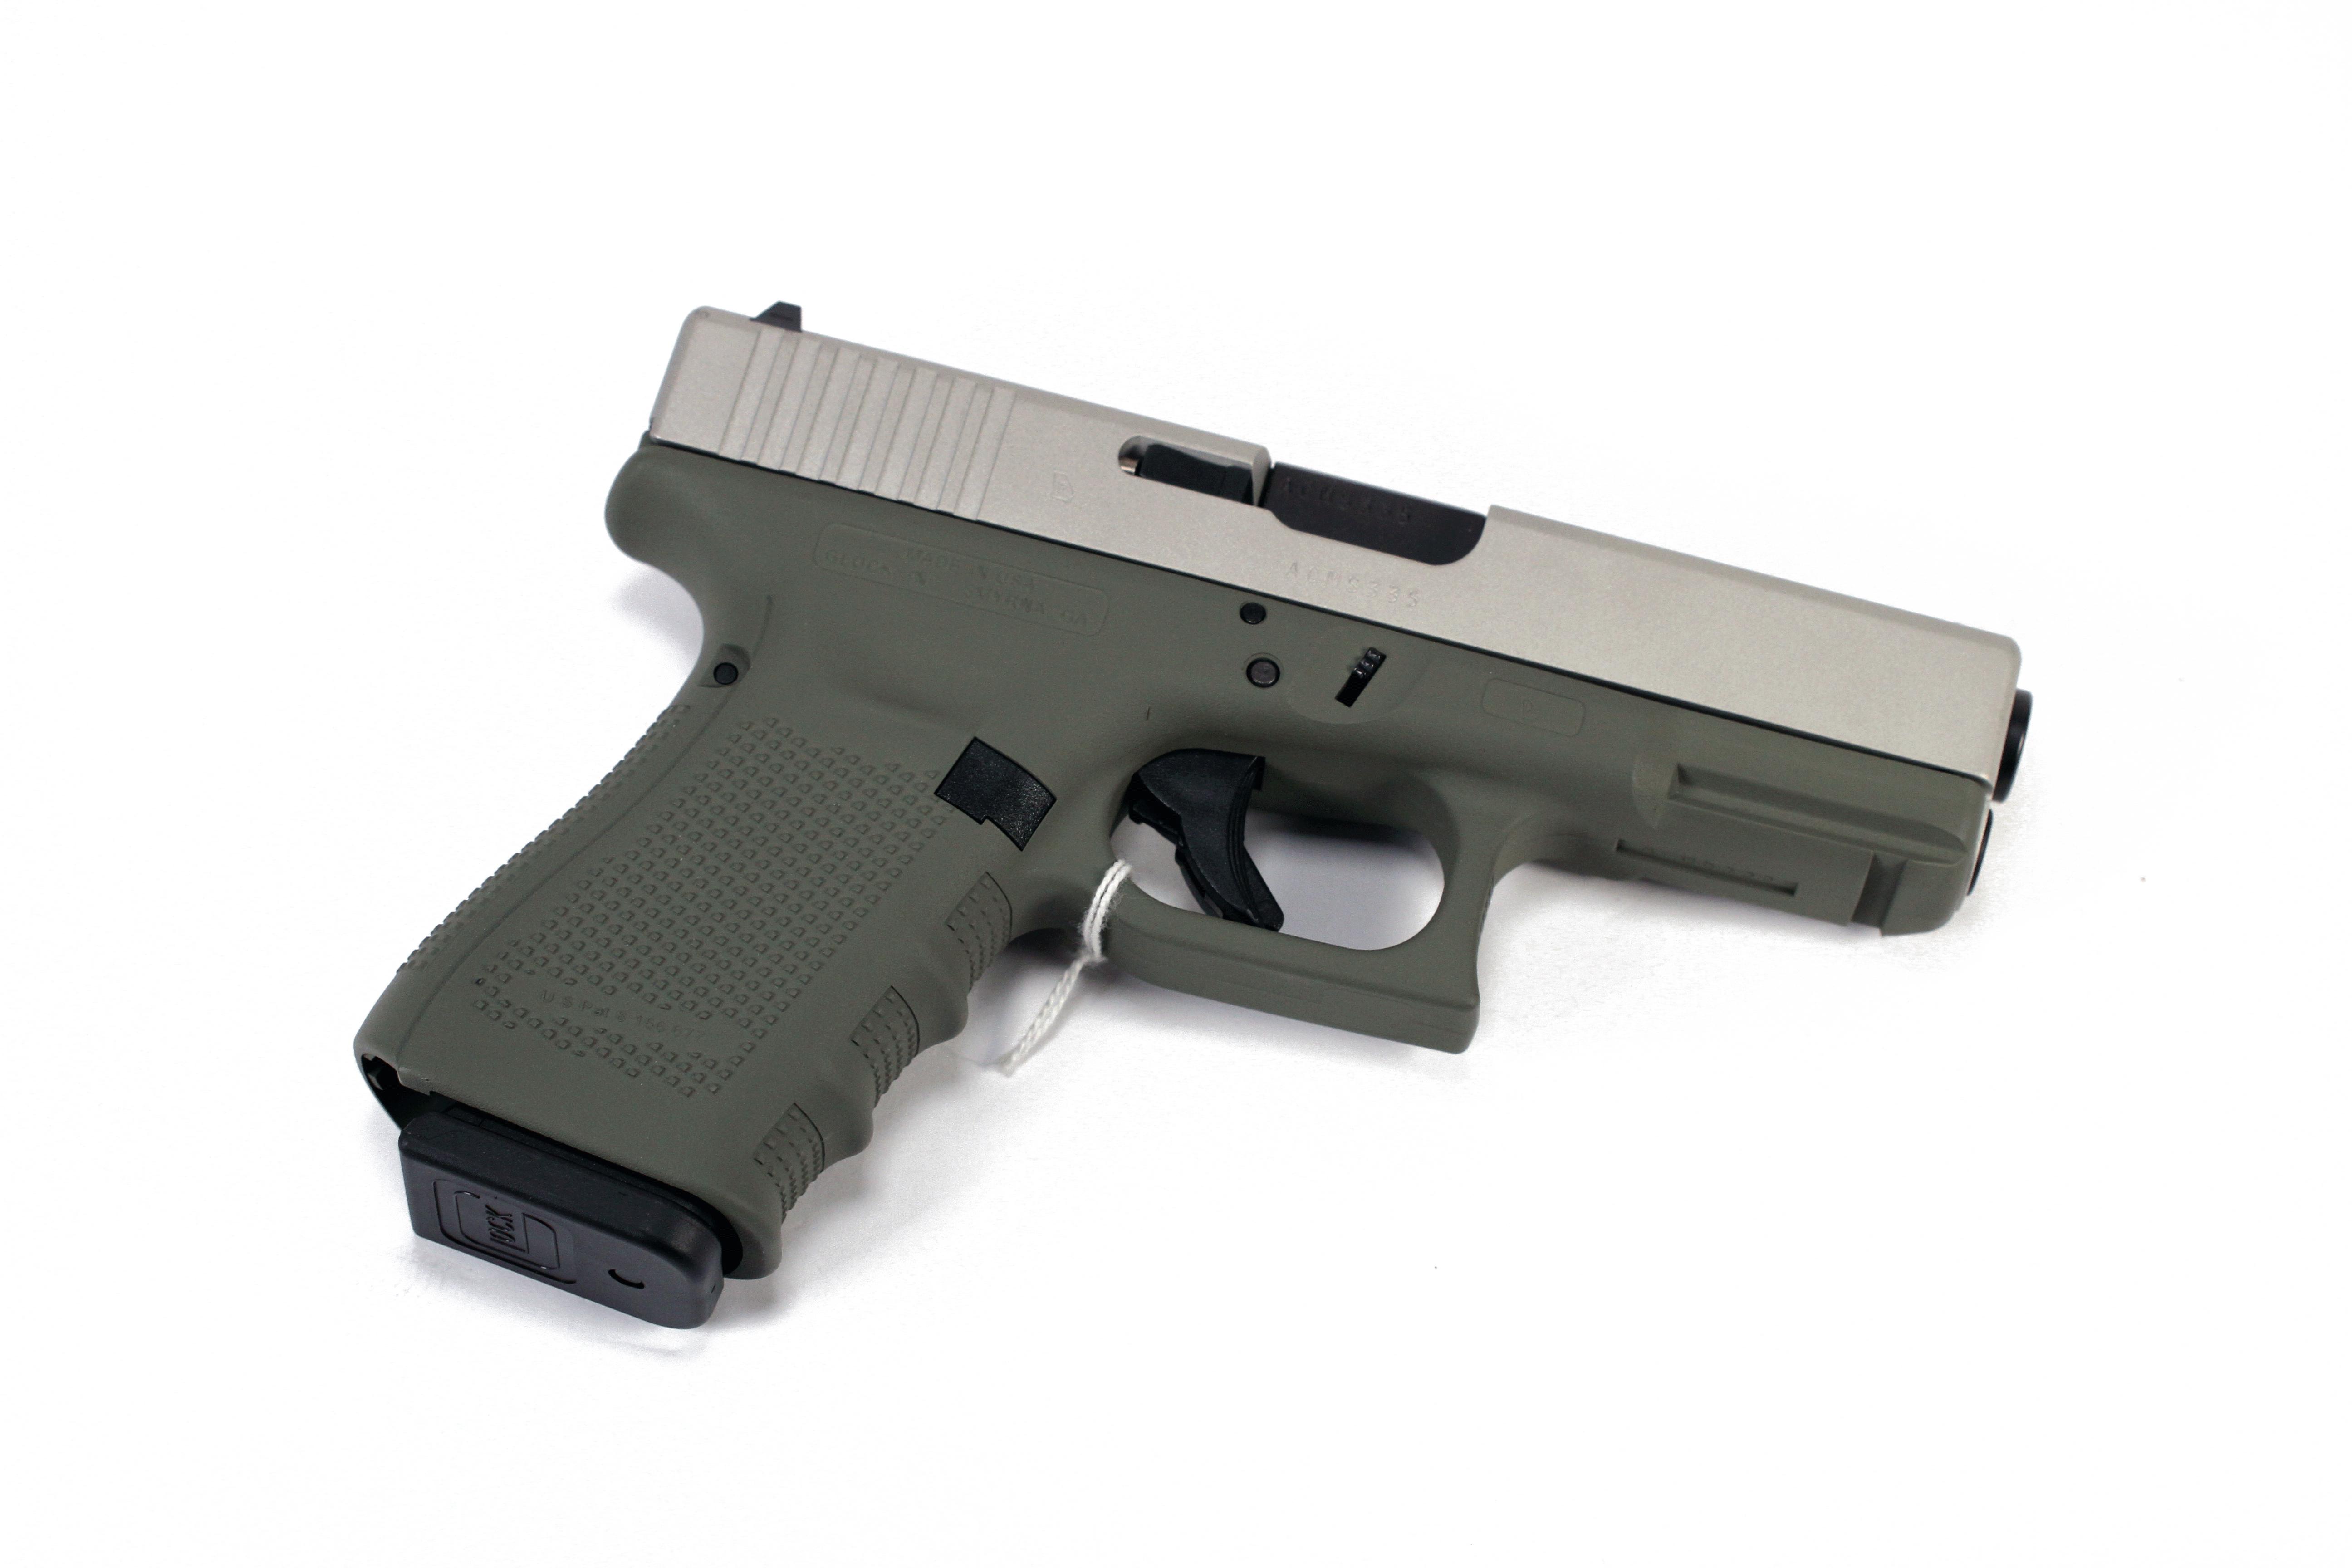 Glock 19 Gen 4 Brushed Stainless Slide/Forest Green Frame